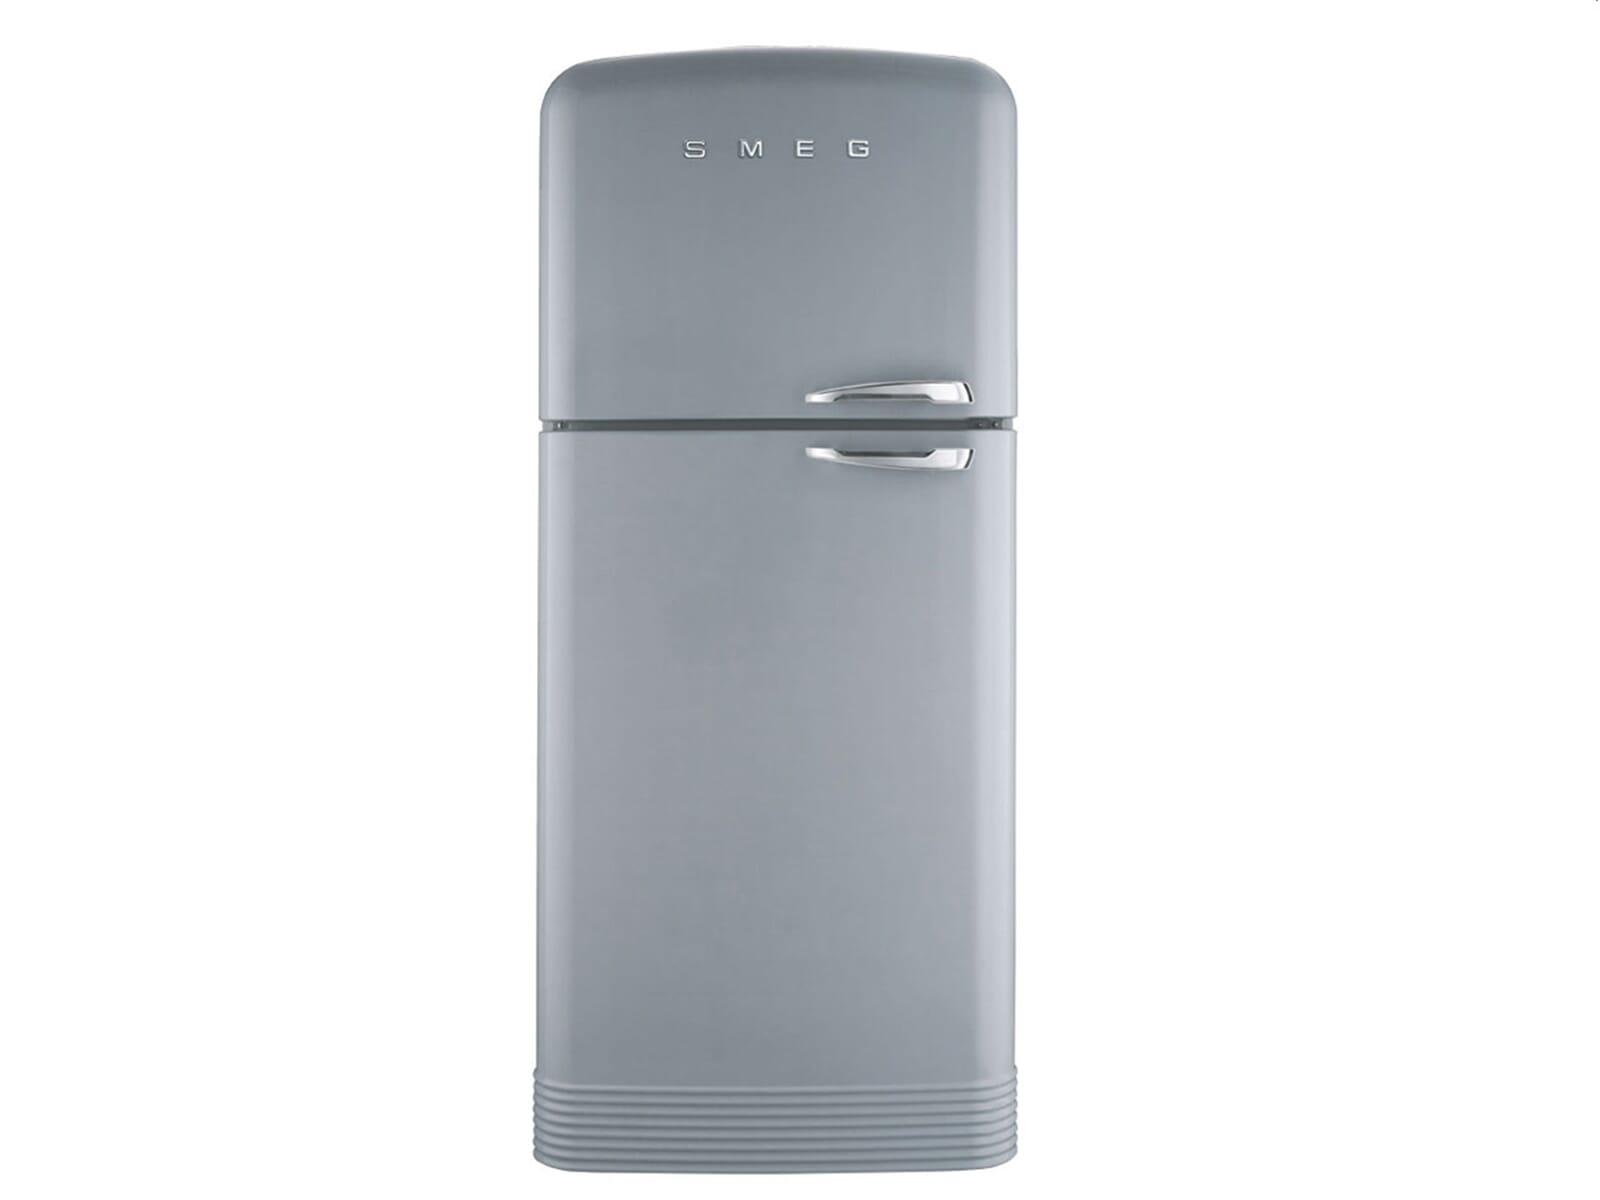 Smeg Kühlschrank Günstig : Smeg kühlschrank günstig charmant kühlschrank smeg bilder die